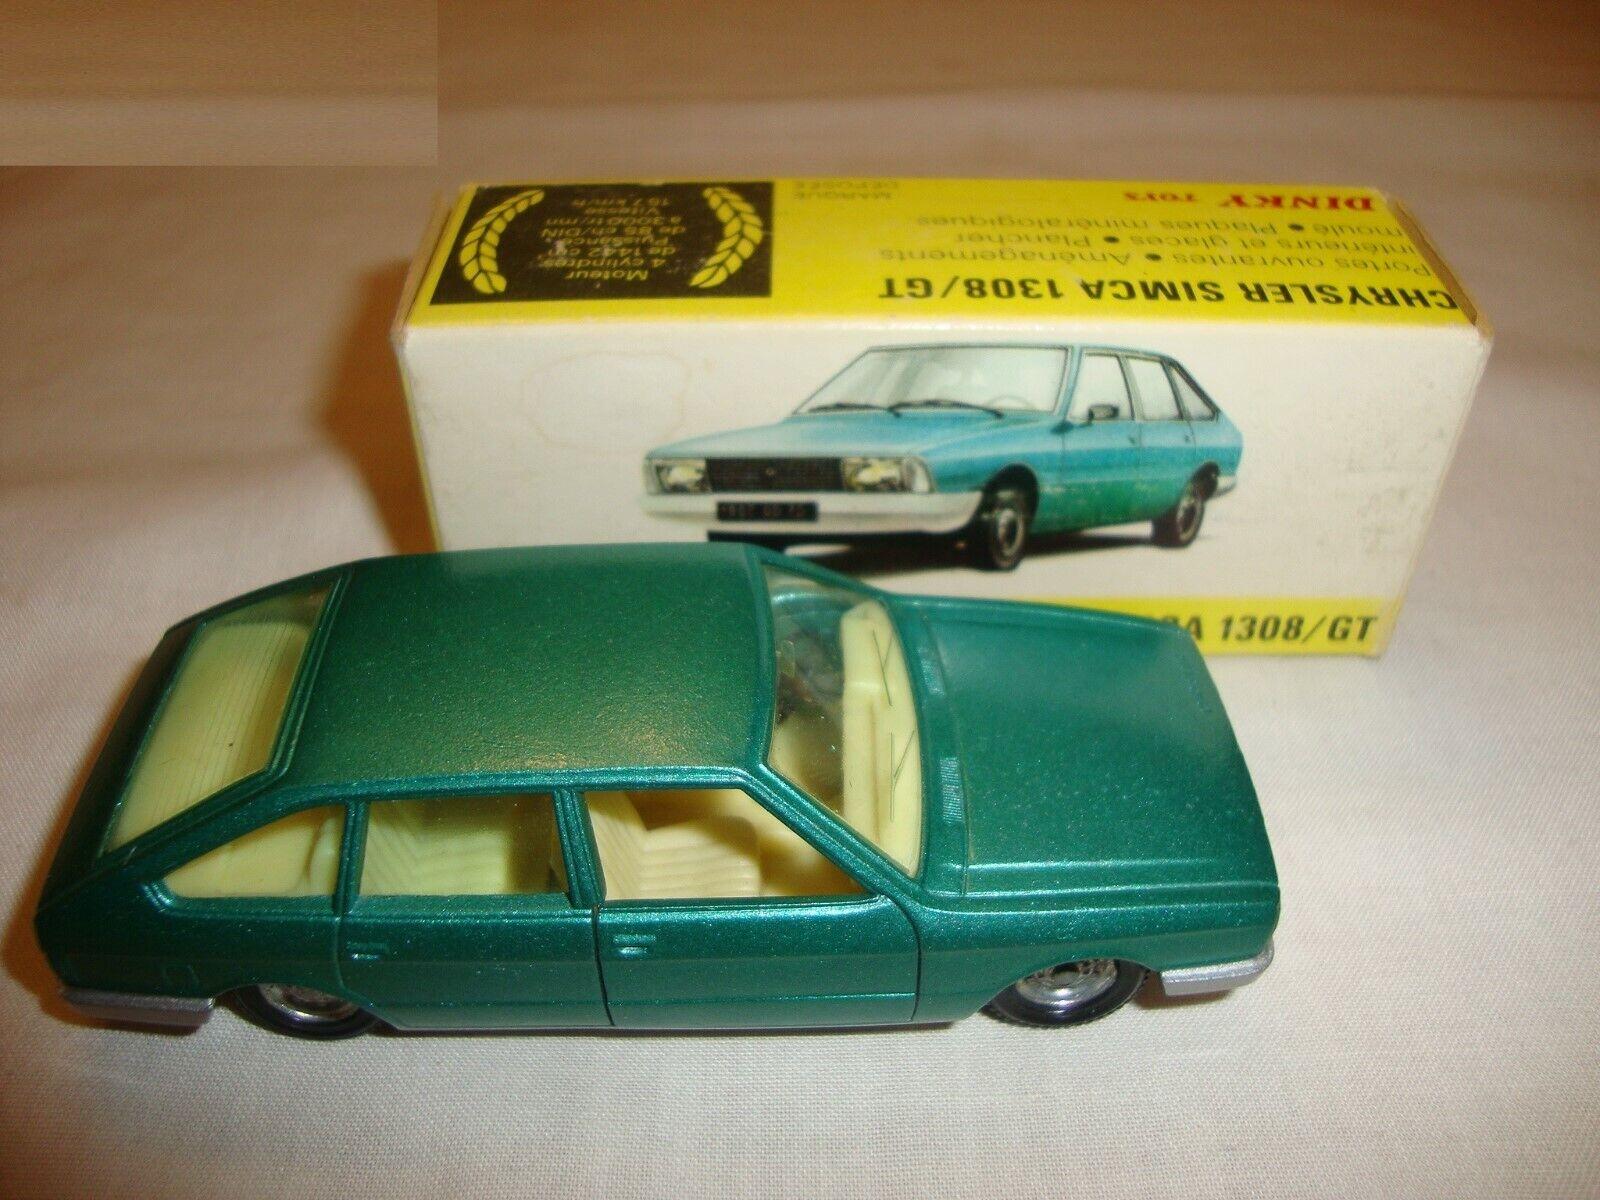 SPANISH DINKY 011542 CHRYSLER 1308 GT - NR MINT in original BOX